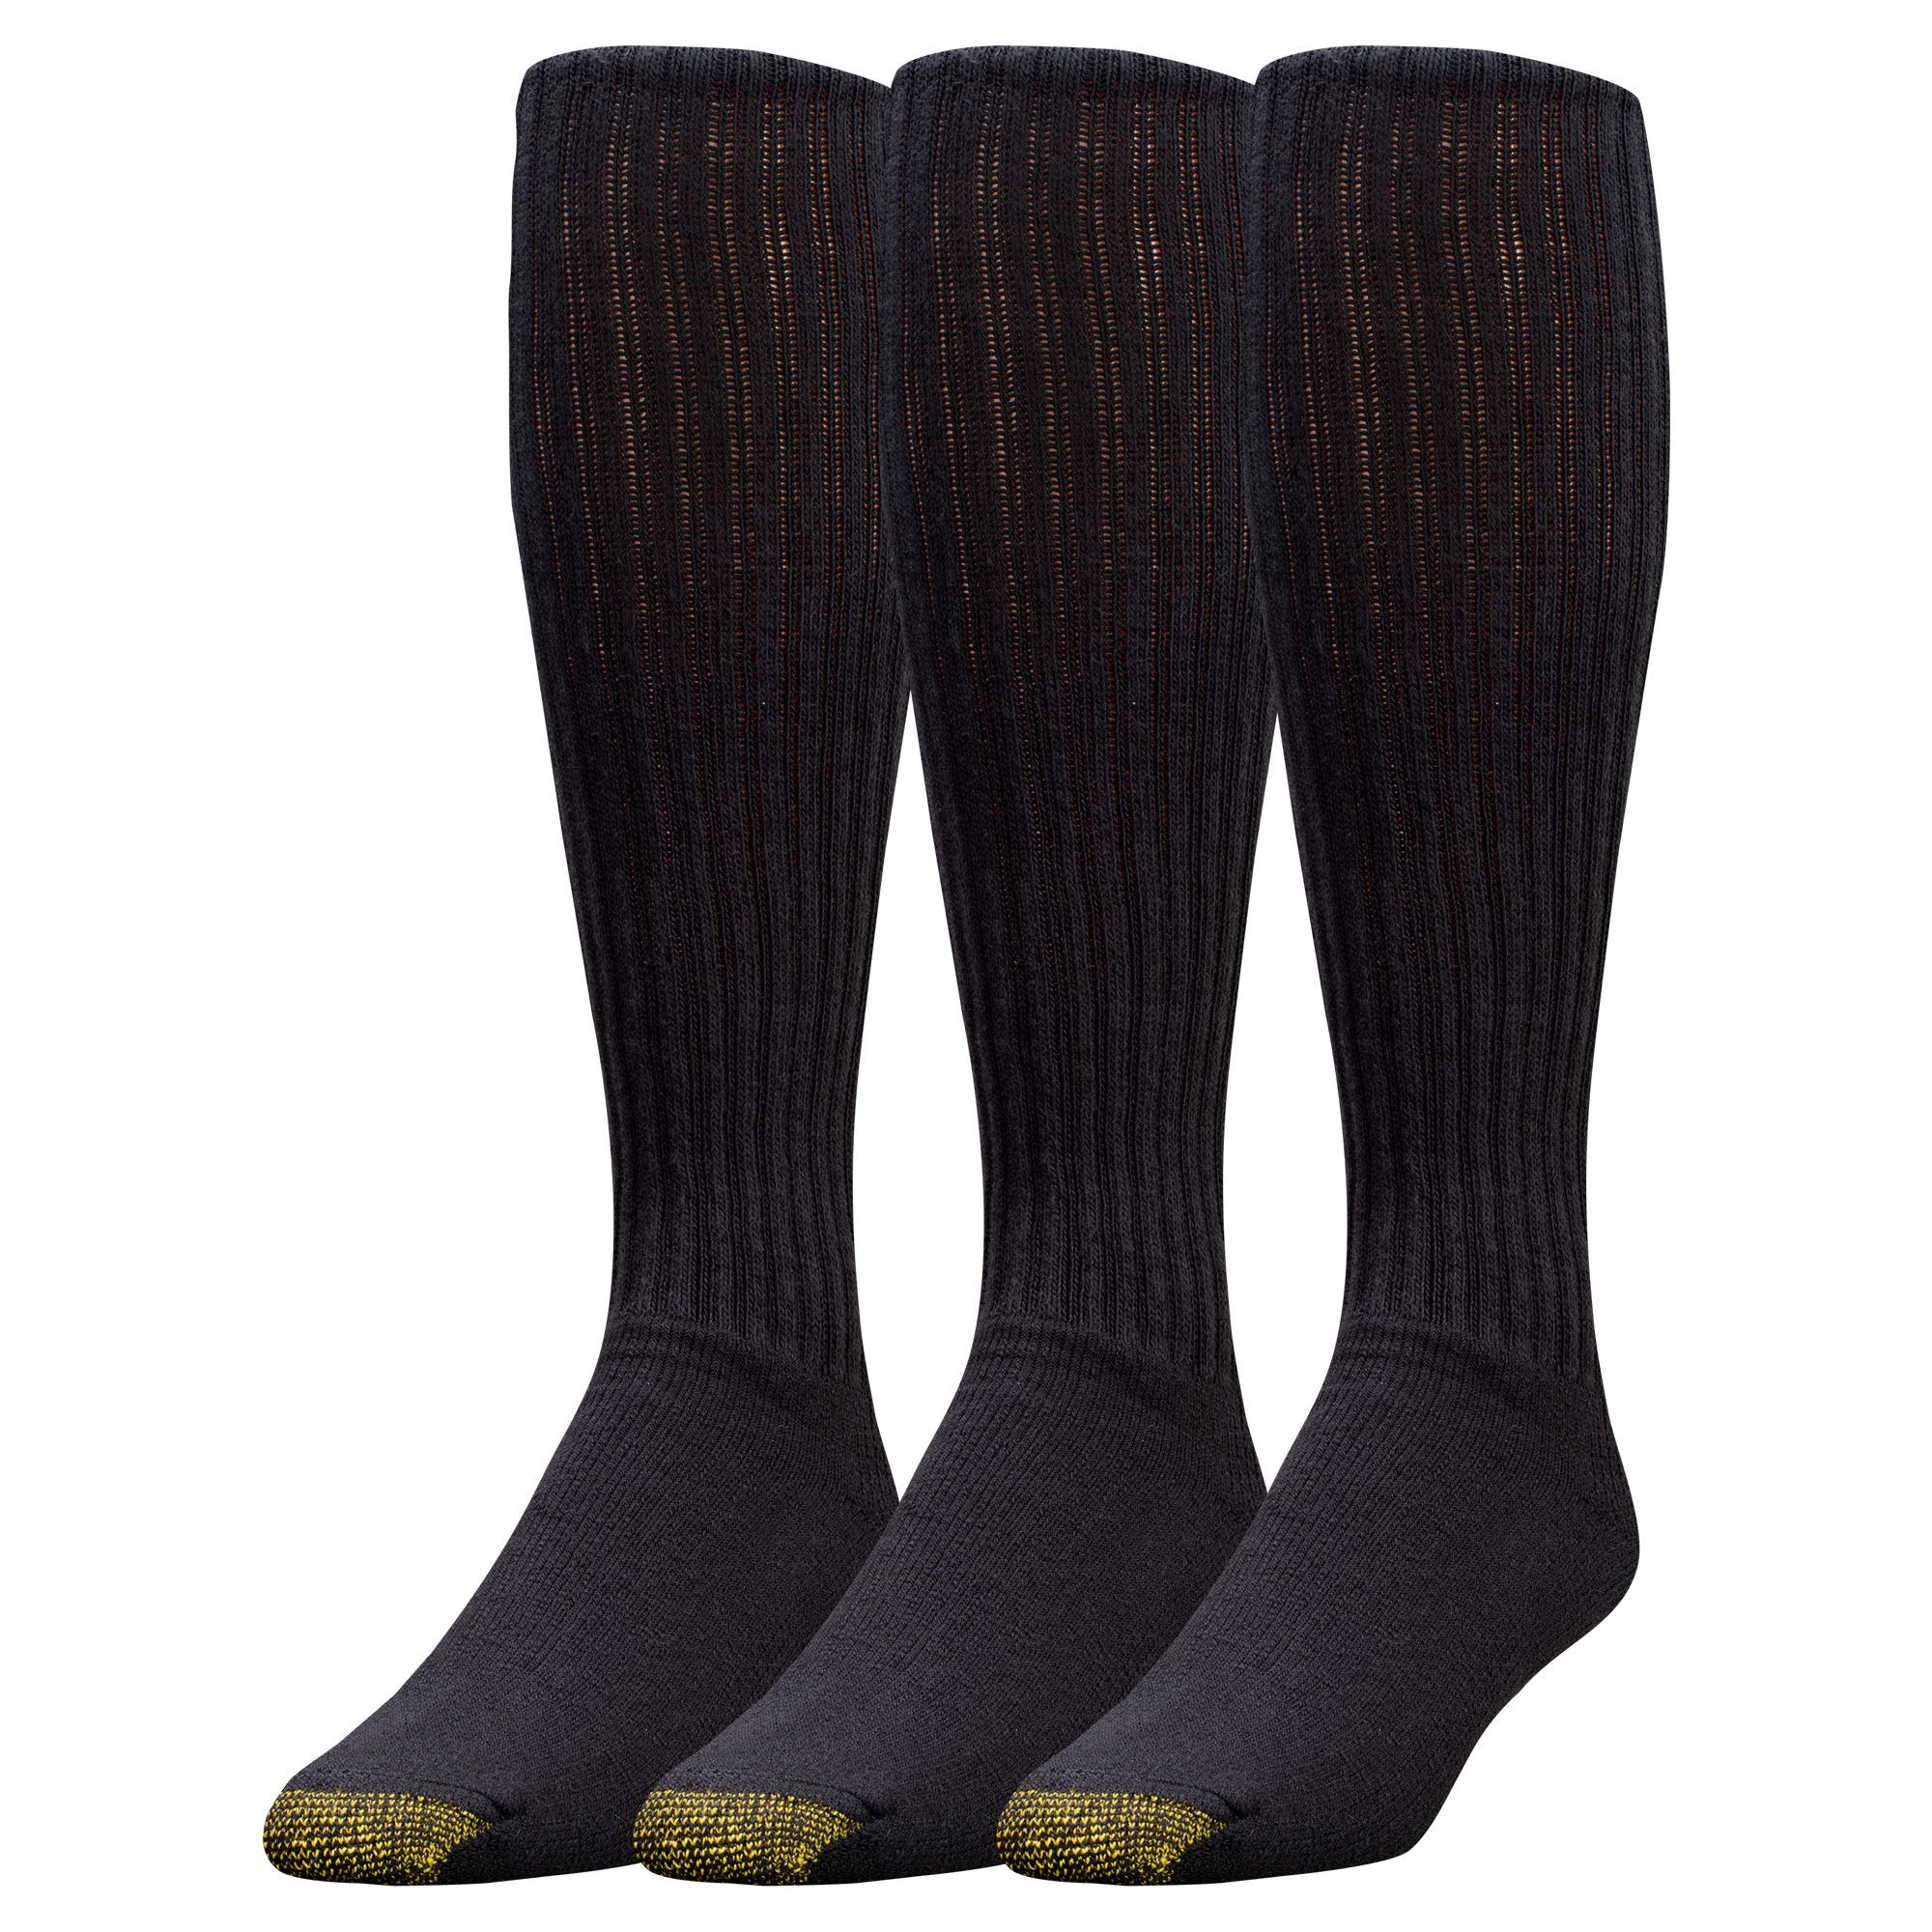 Gold Toe Men's Ultra Tec Performance Over The Calf Athletic Socks, 3-Pack, Black, Shoe Size: 6-12.5 (4 PK 12 PAIRS)